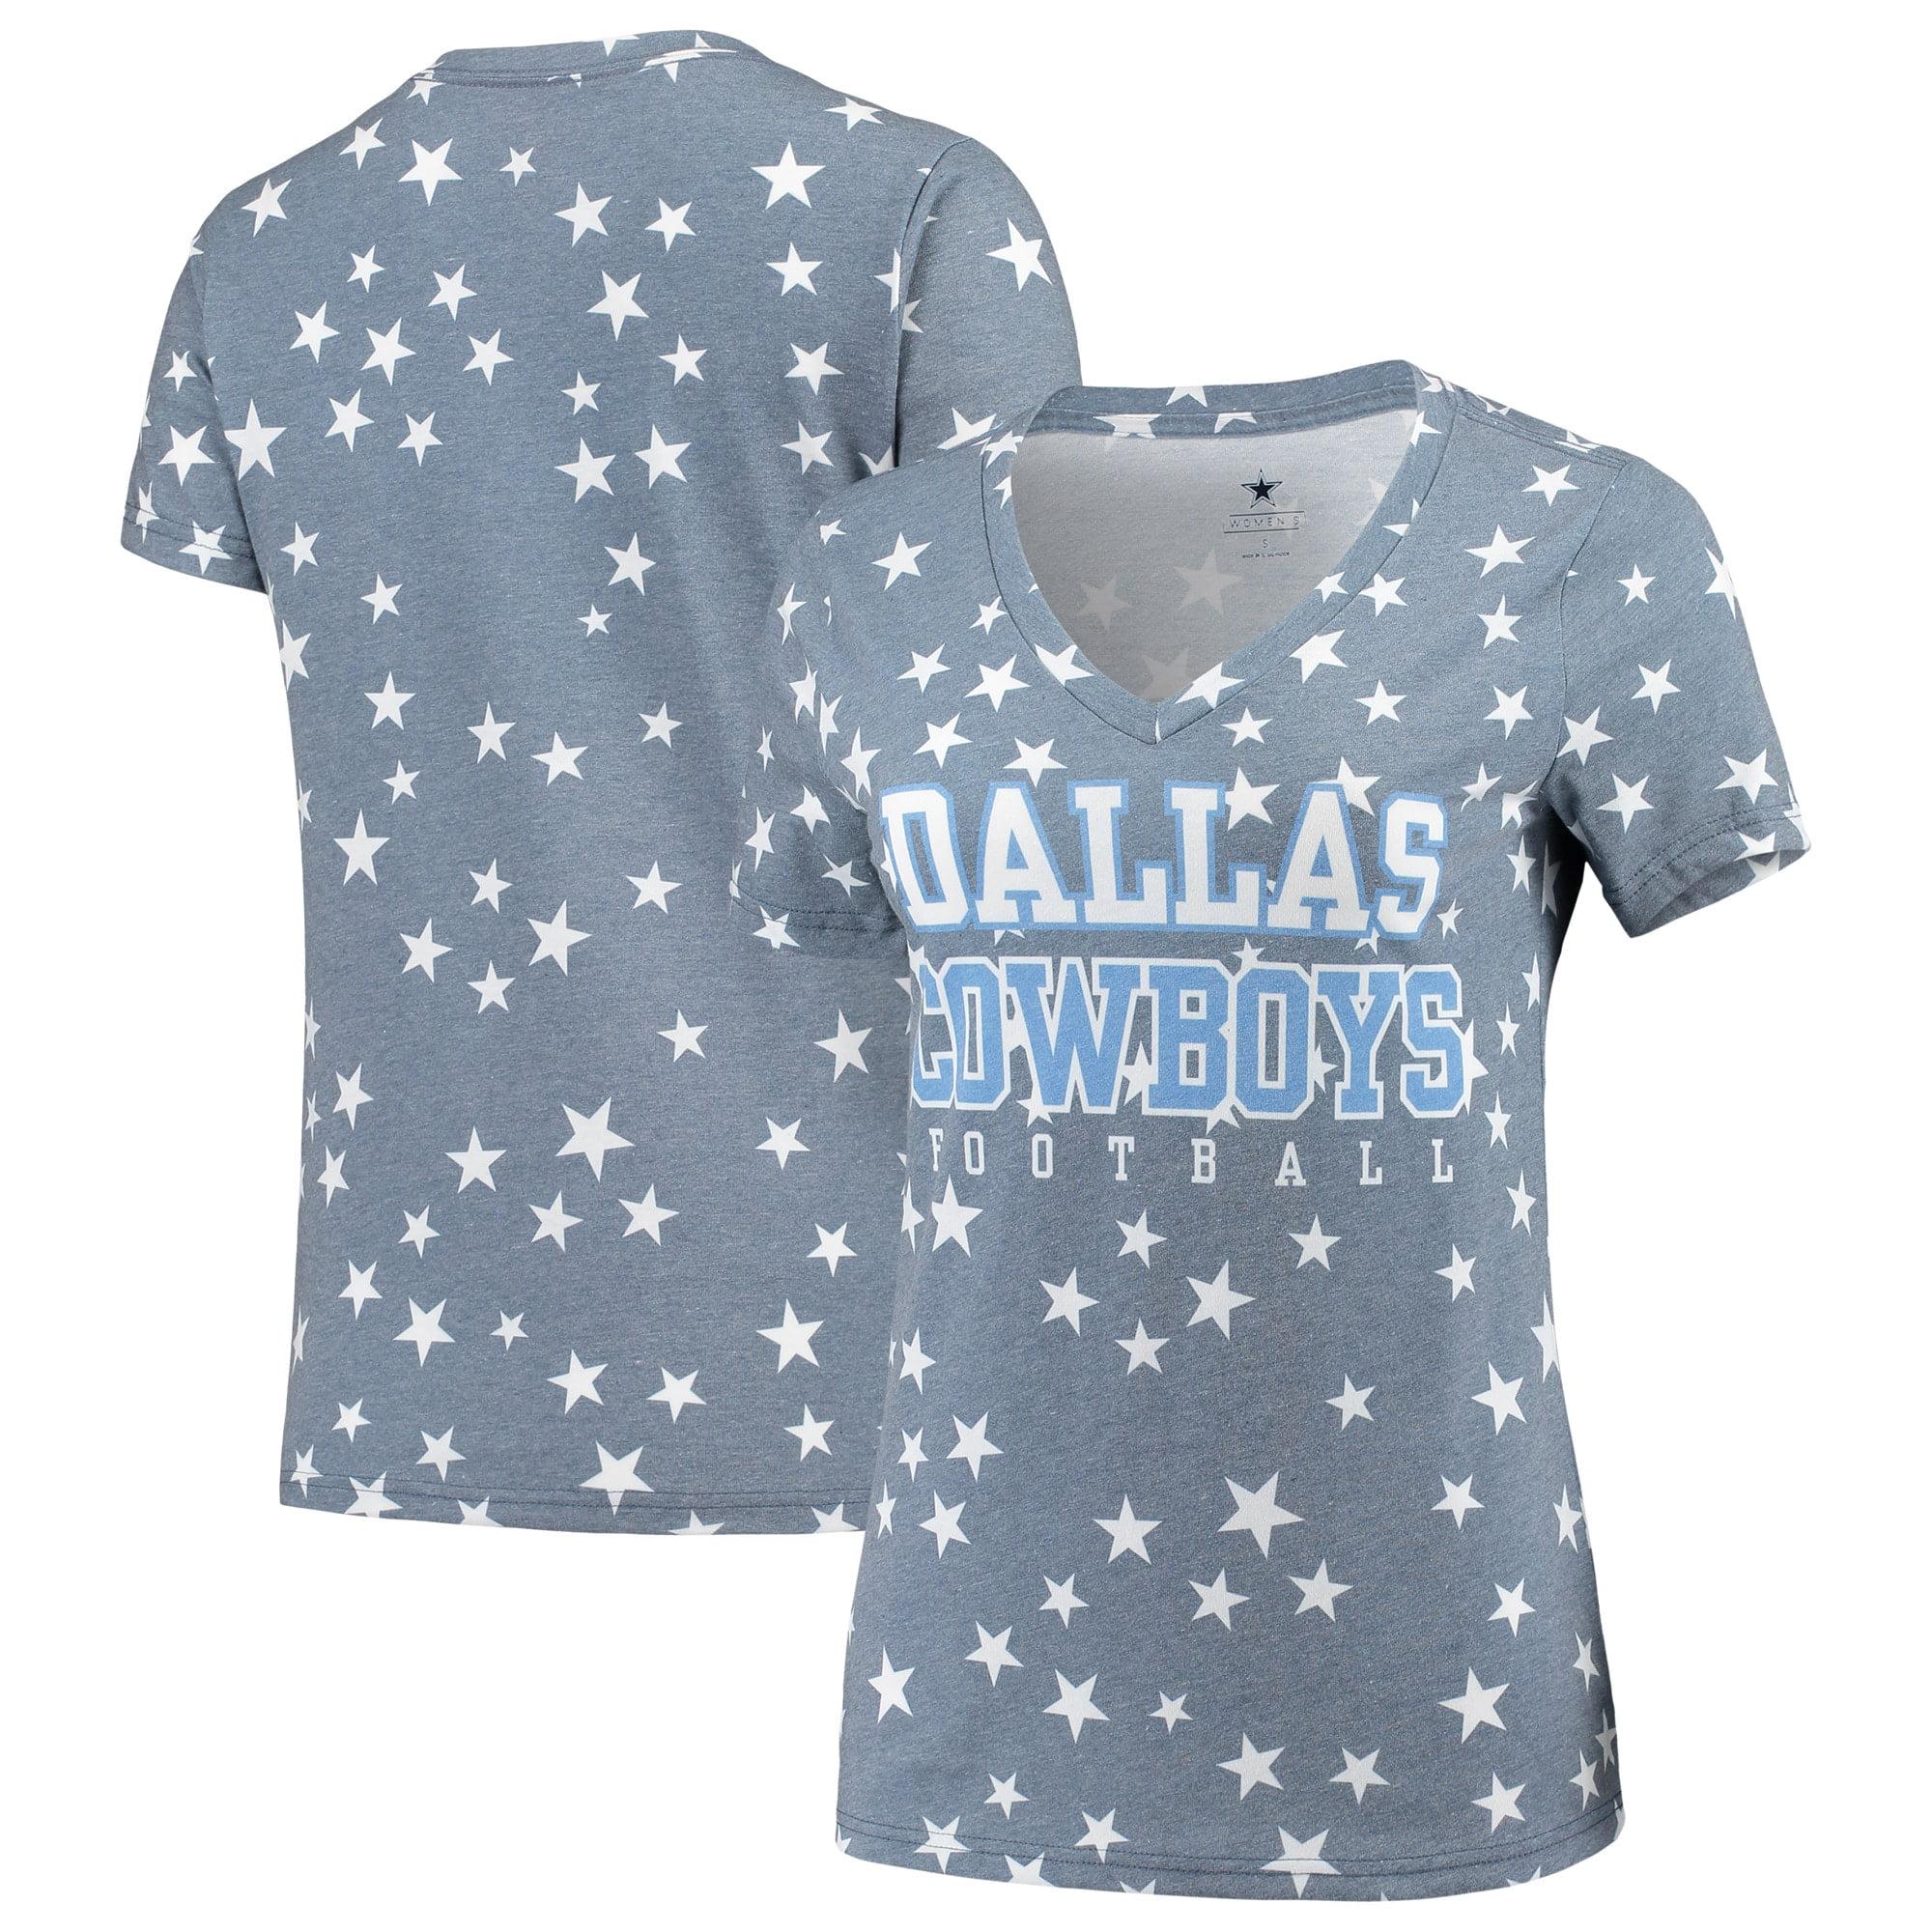 Dallas Cowboys NCAA Womens University Womens Plus Size Vee-Neck Short Sleeve Tee Shirt